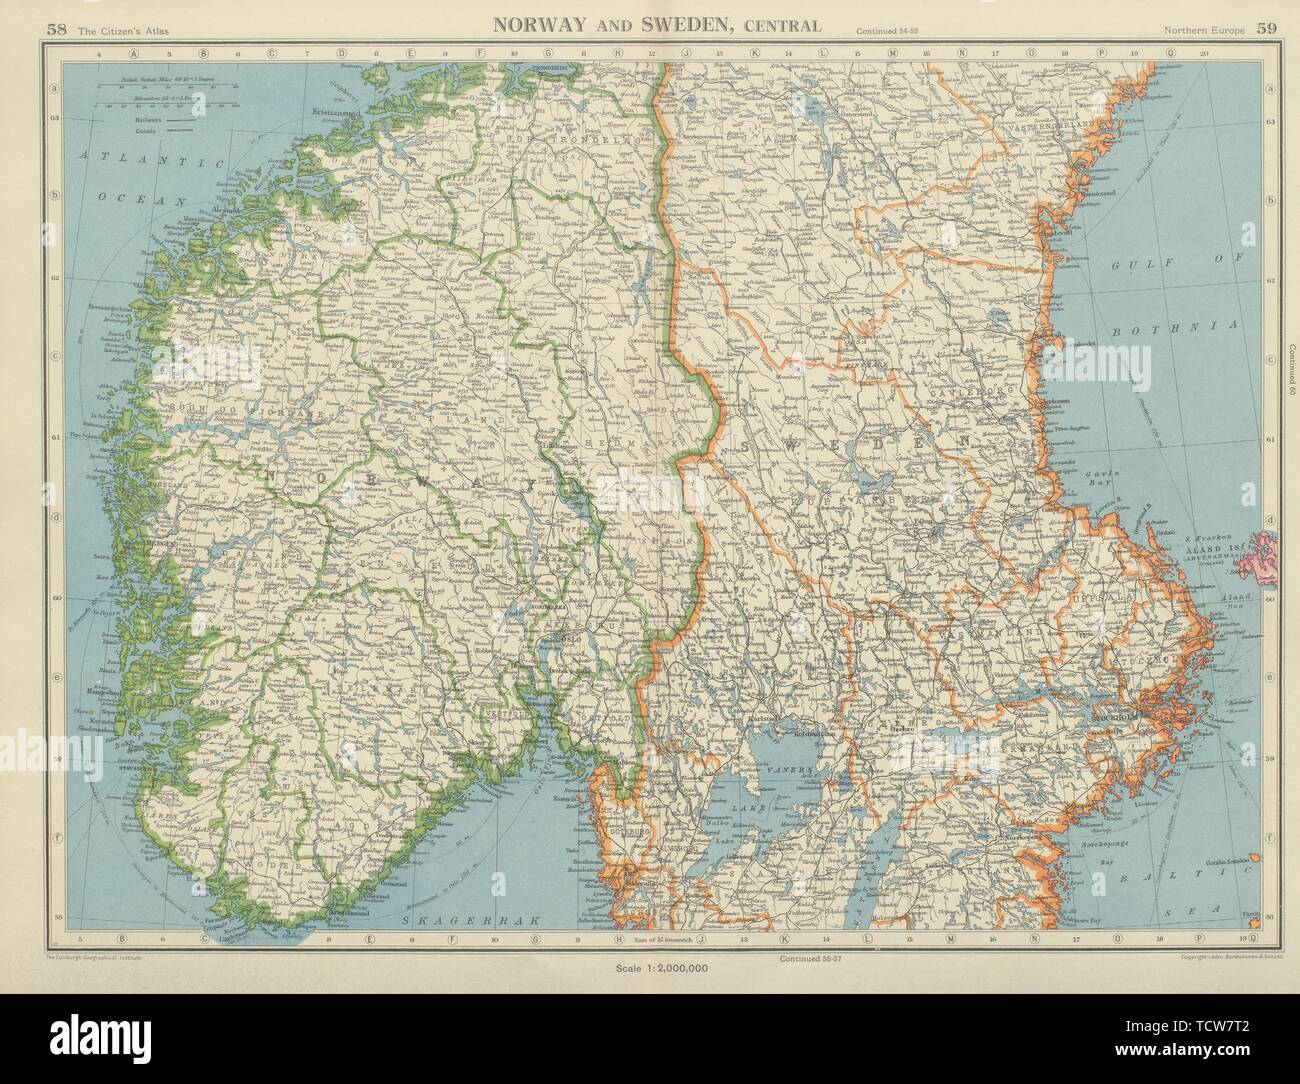 SCANDINAVIA. Norway and Sweden, Central. Railways. BARTHOLOMEW 1947 old map - Stock Image